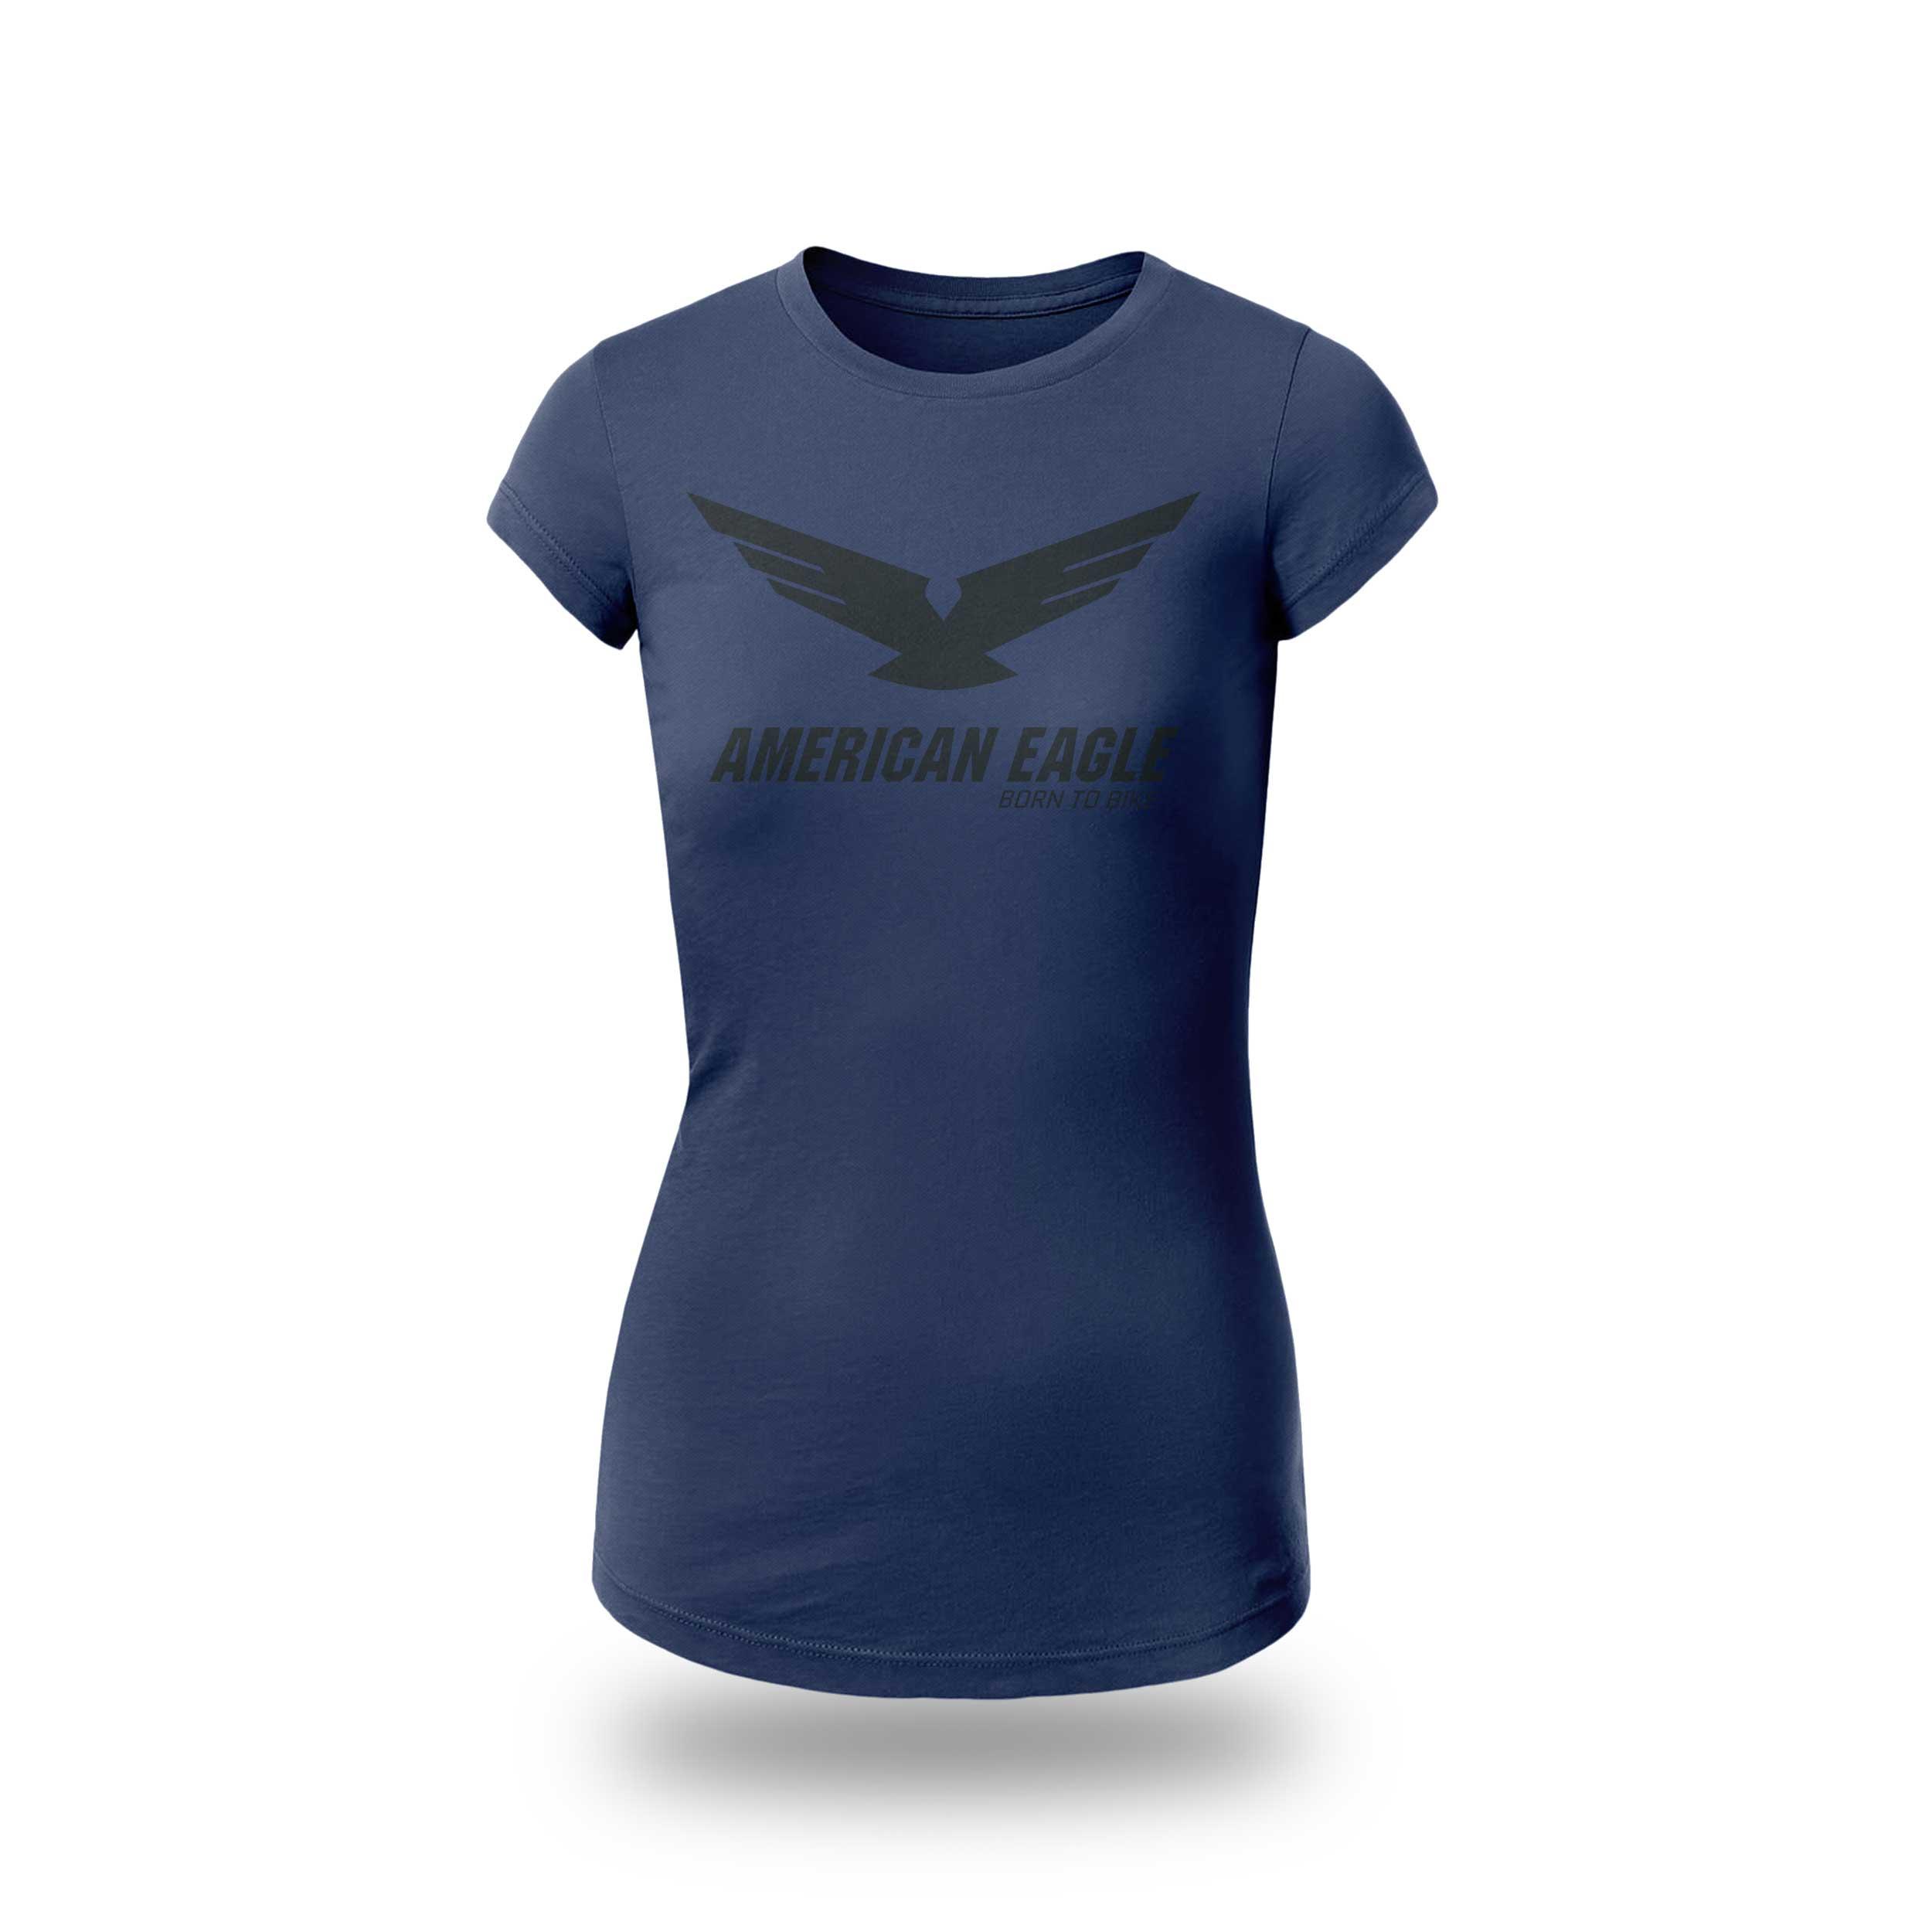 American eagle shirt ladies american eagle for Eagles t shirt womens